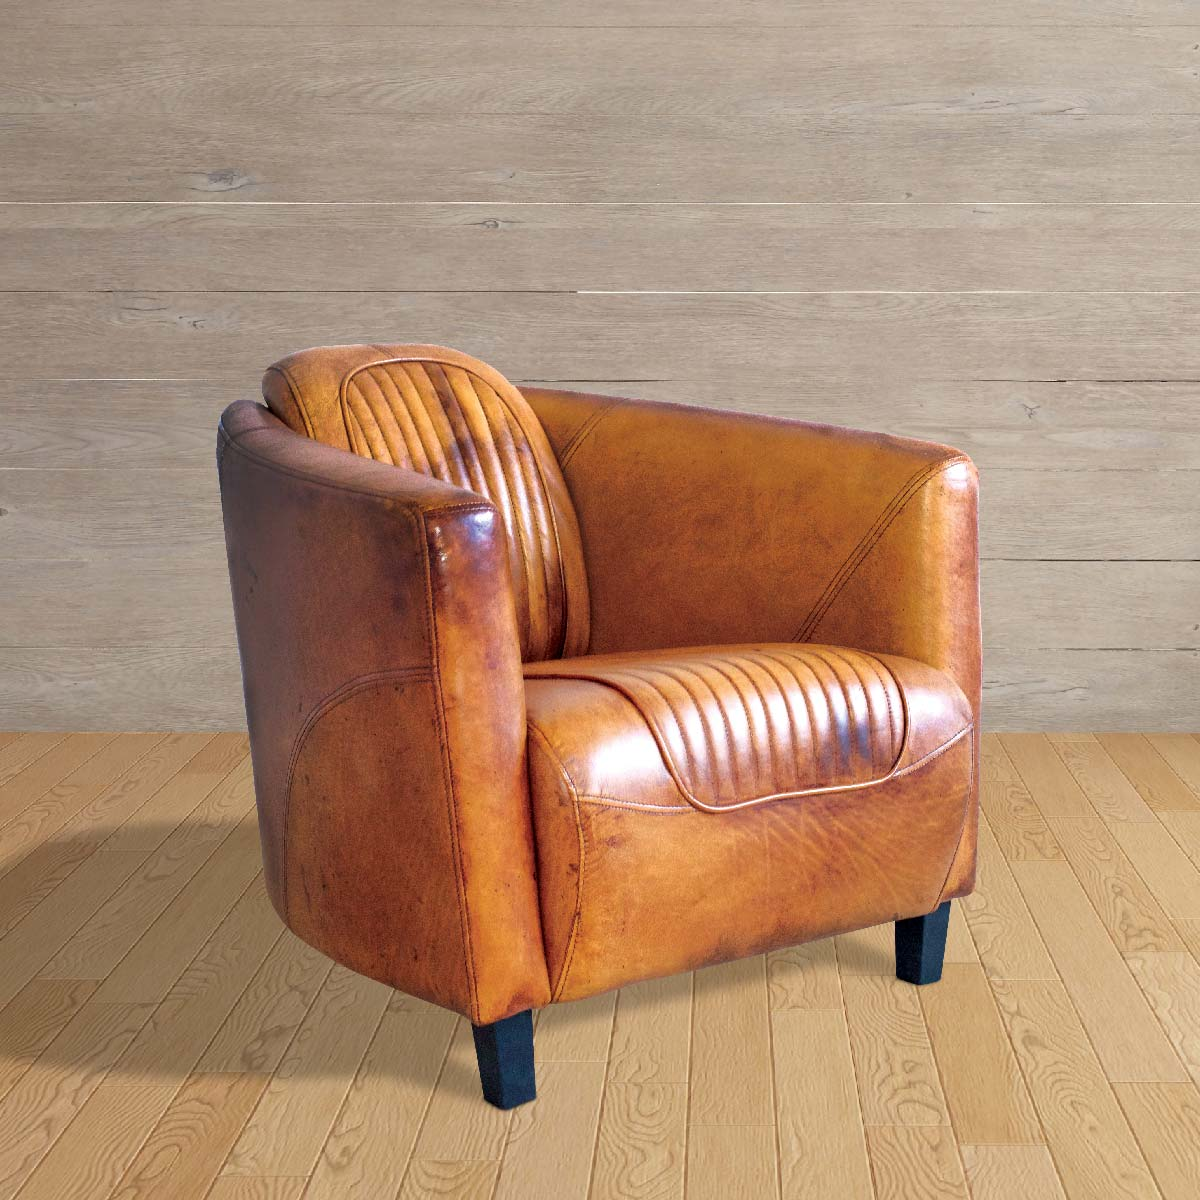 Pheobe-Club-Chair-Cozy-Home-Dubai